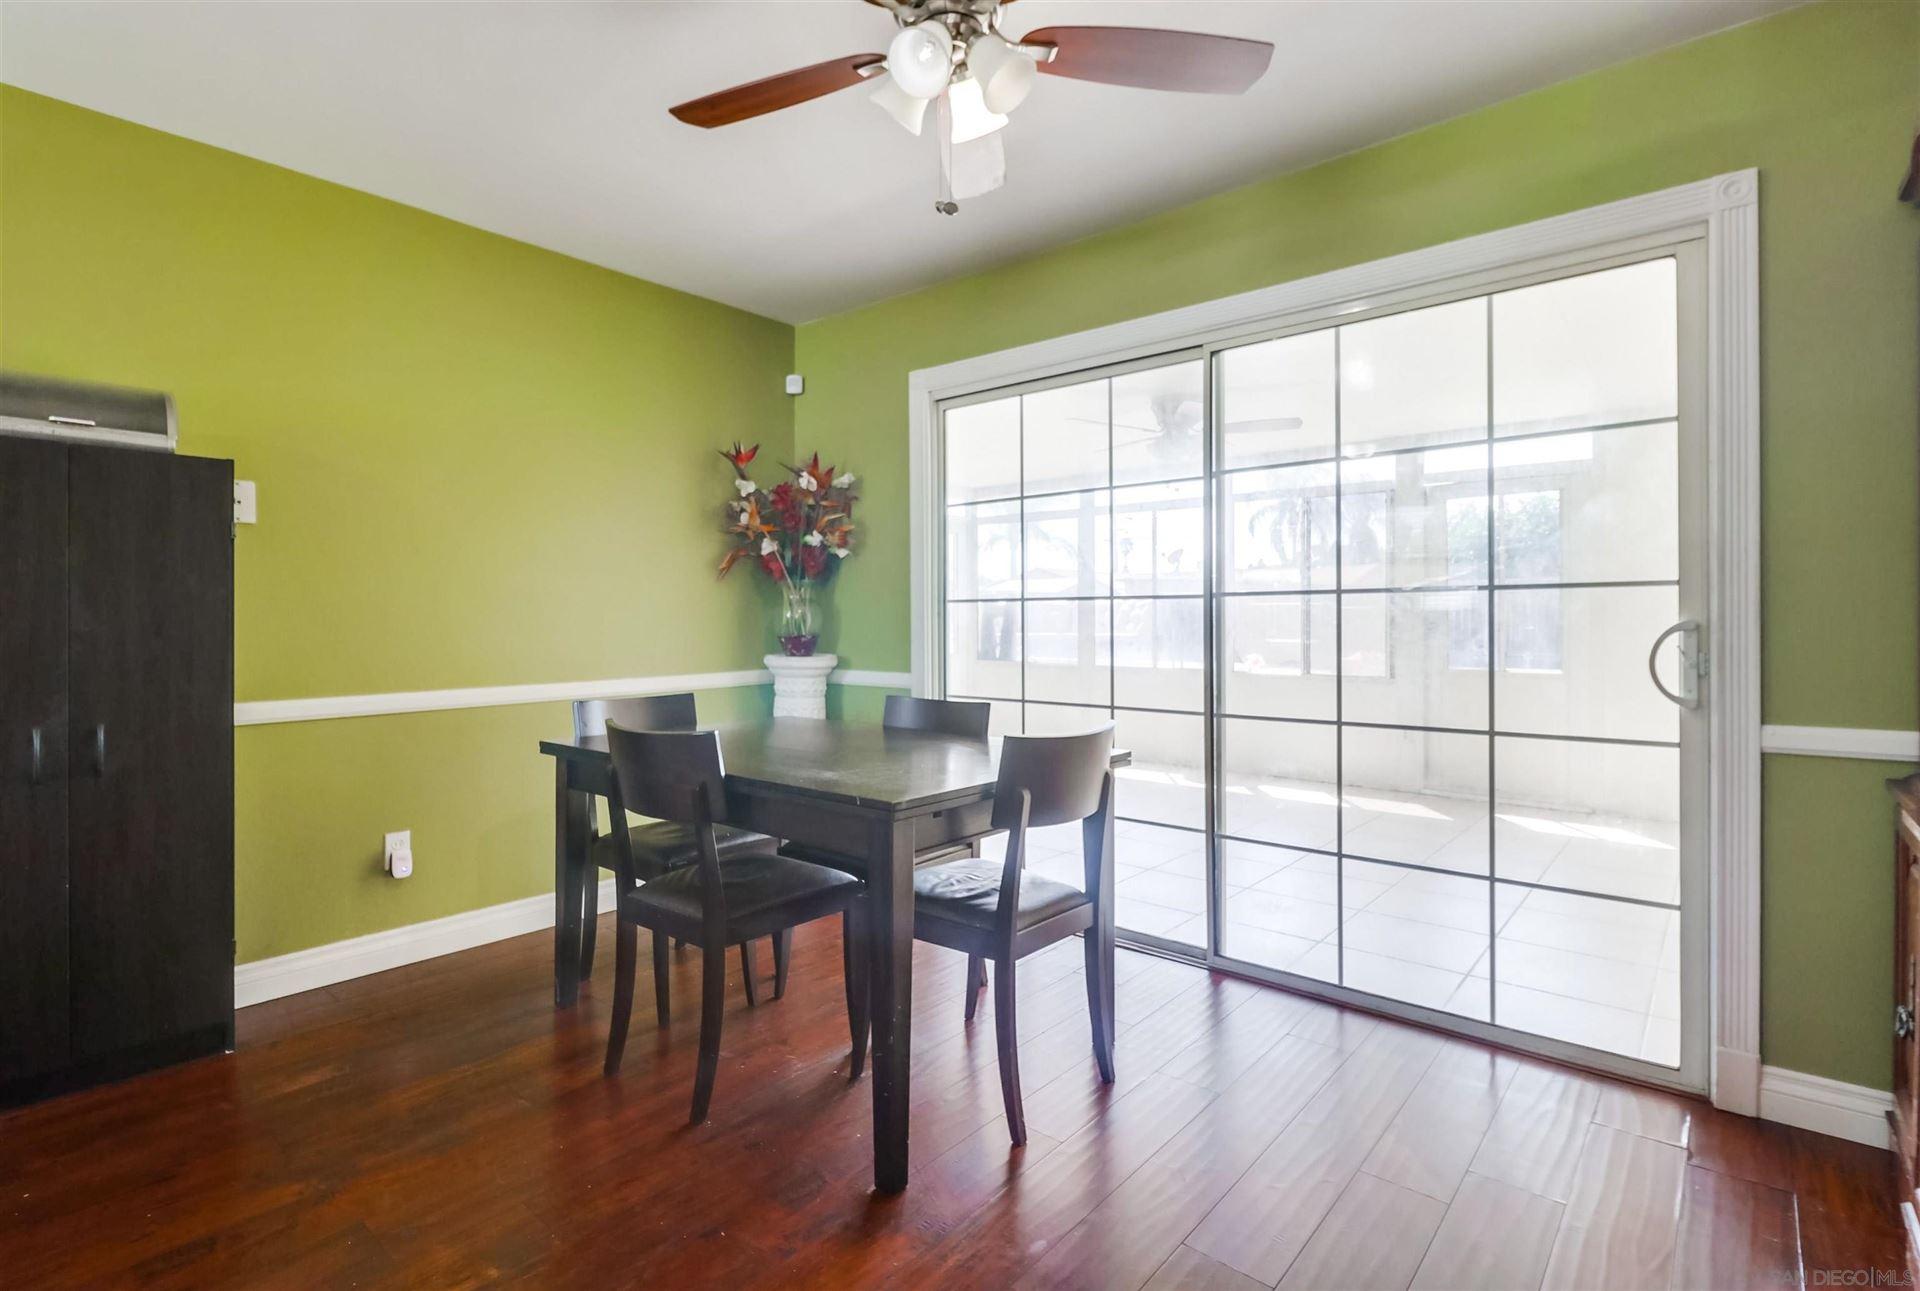 Photo of 842 Broadview St., Spring Valley, CA 91977 (MLS # 210024760)